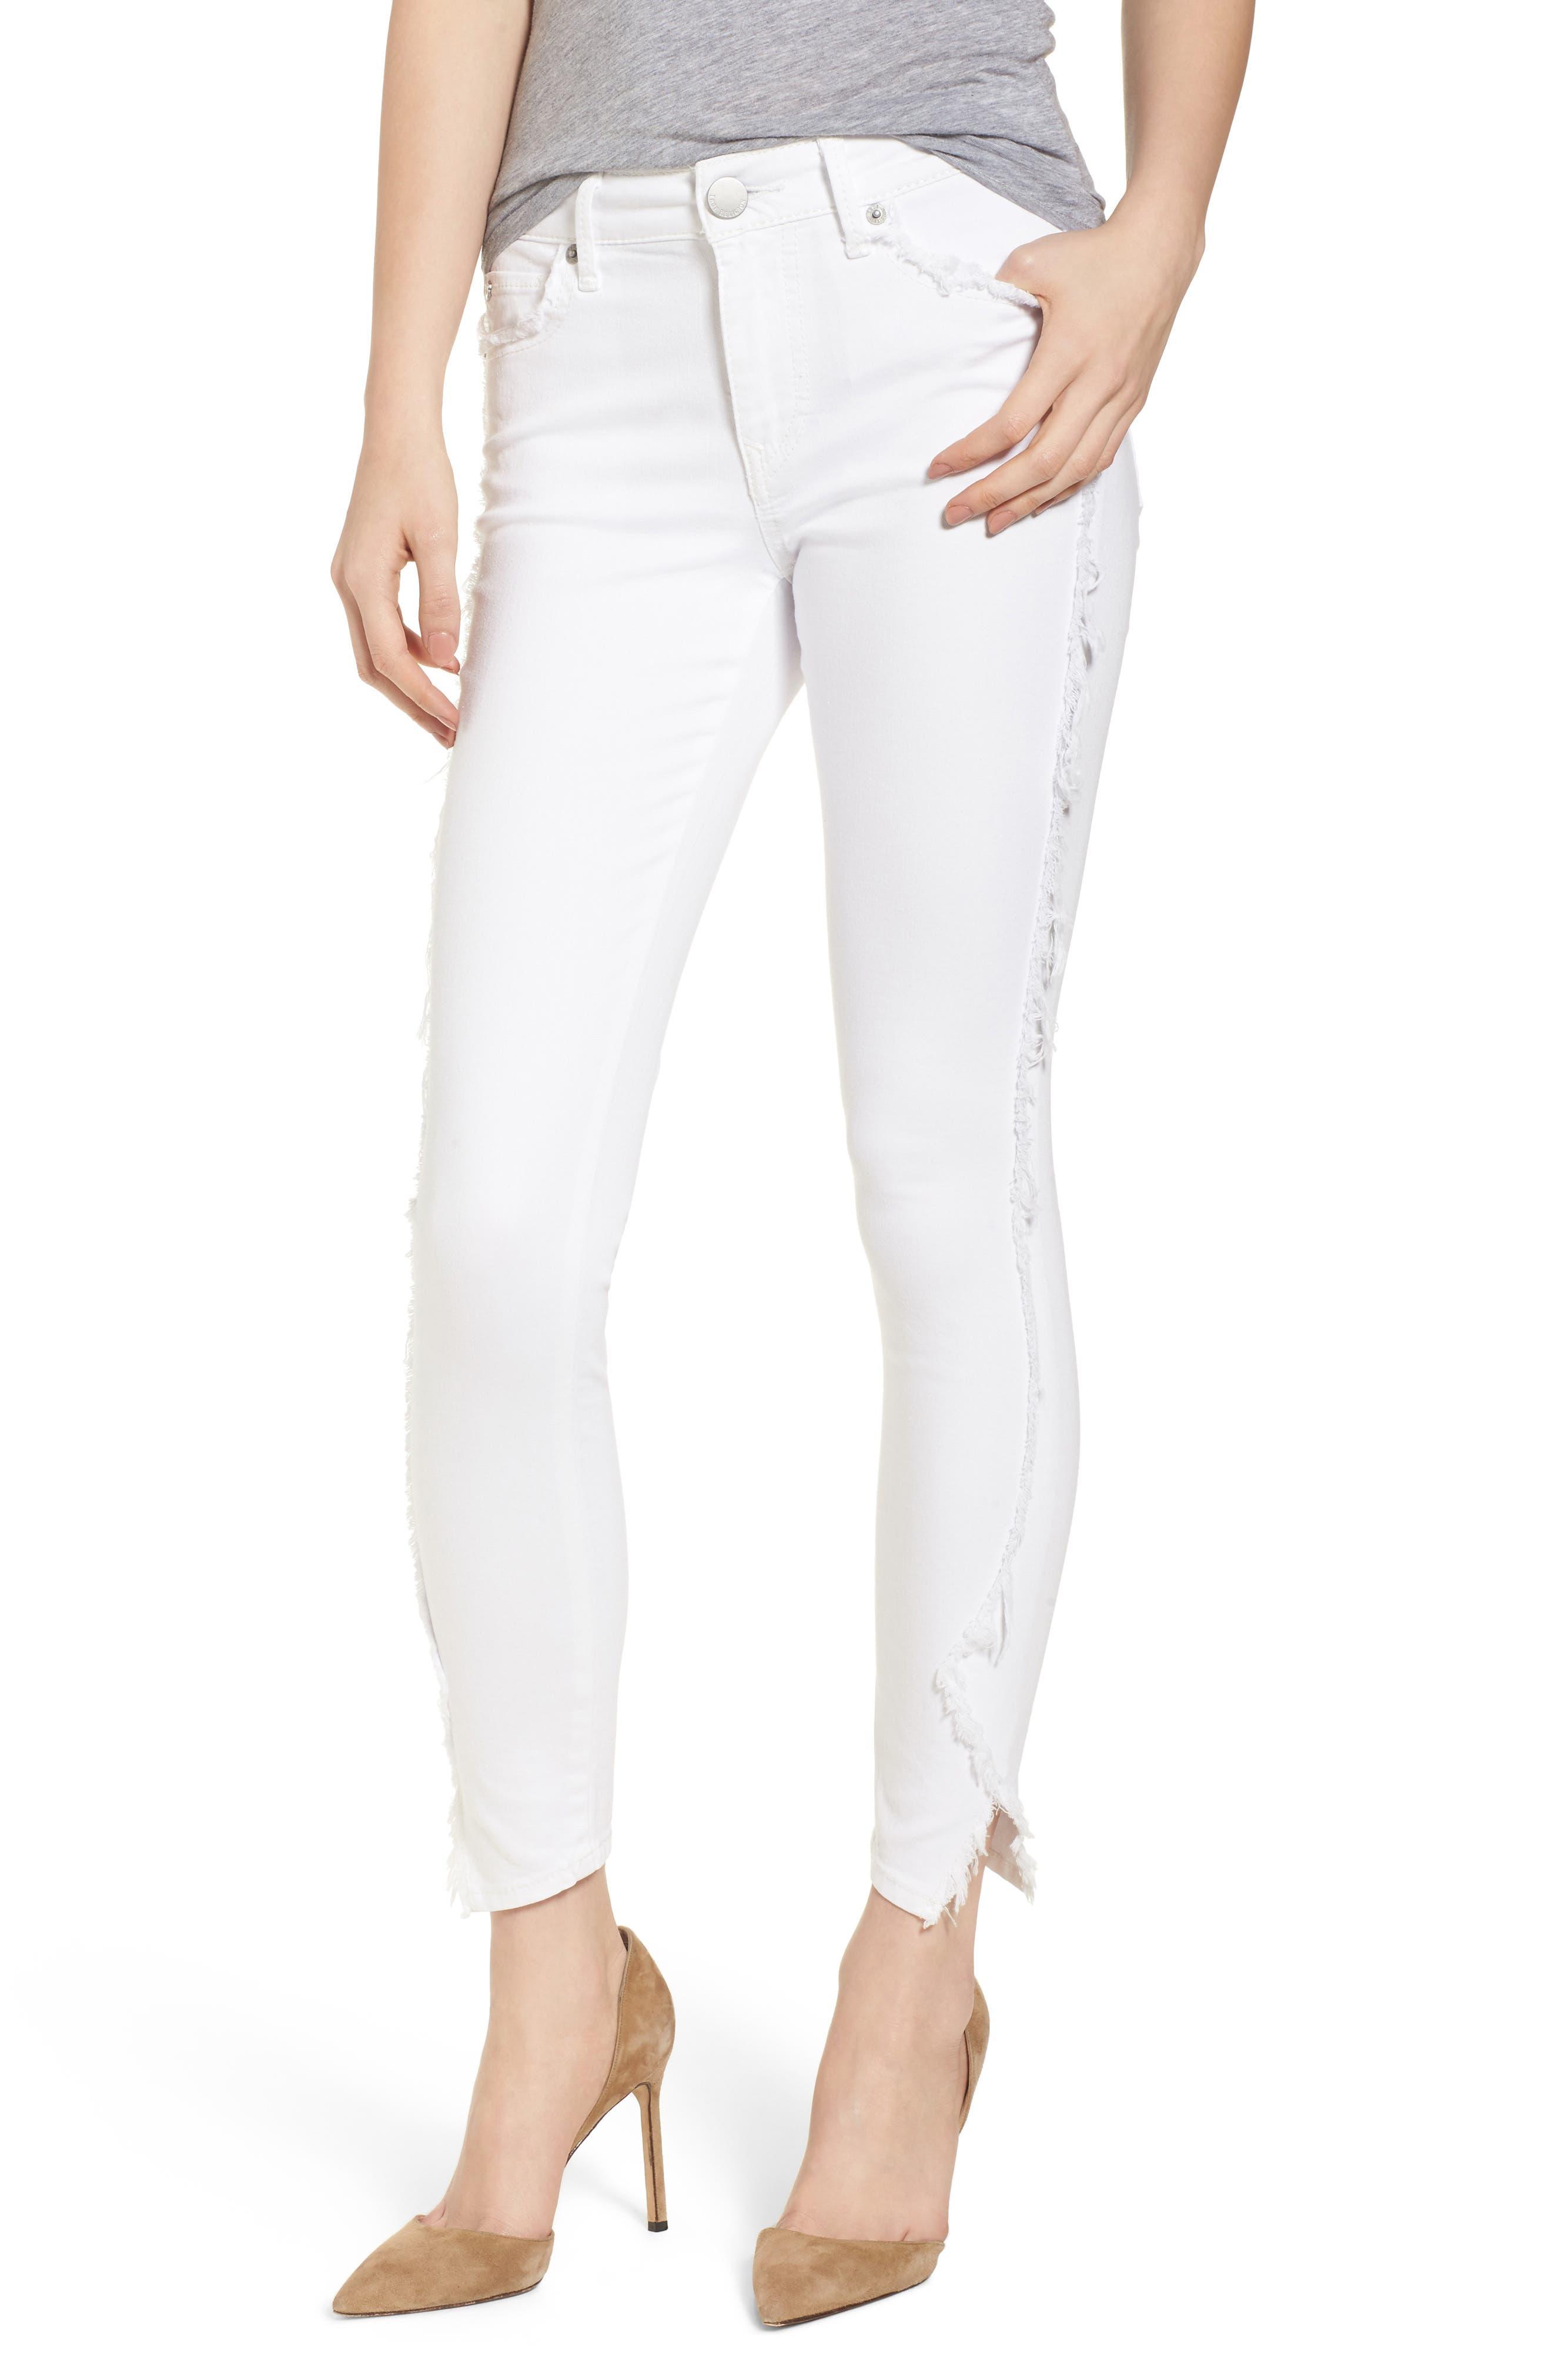 Jennie Curvy Skinny Jeans,                         Main,                         color, Optic White